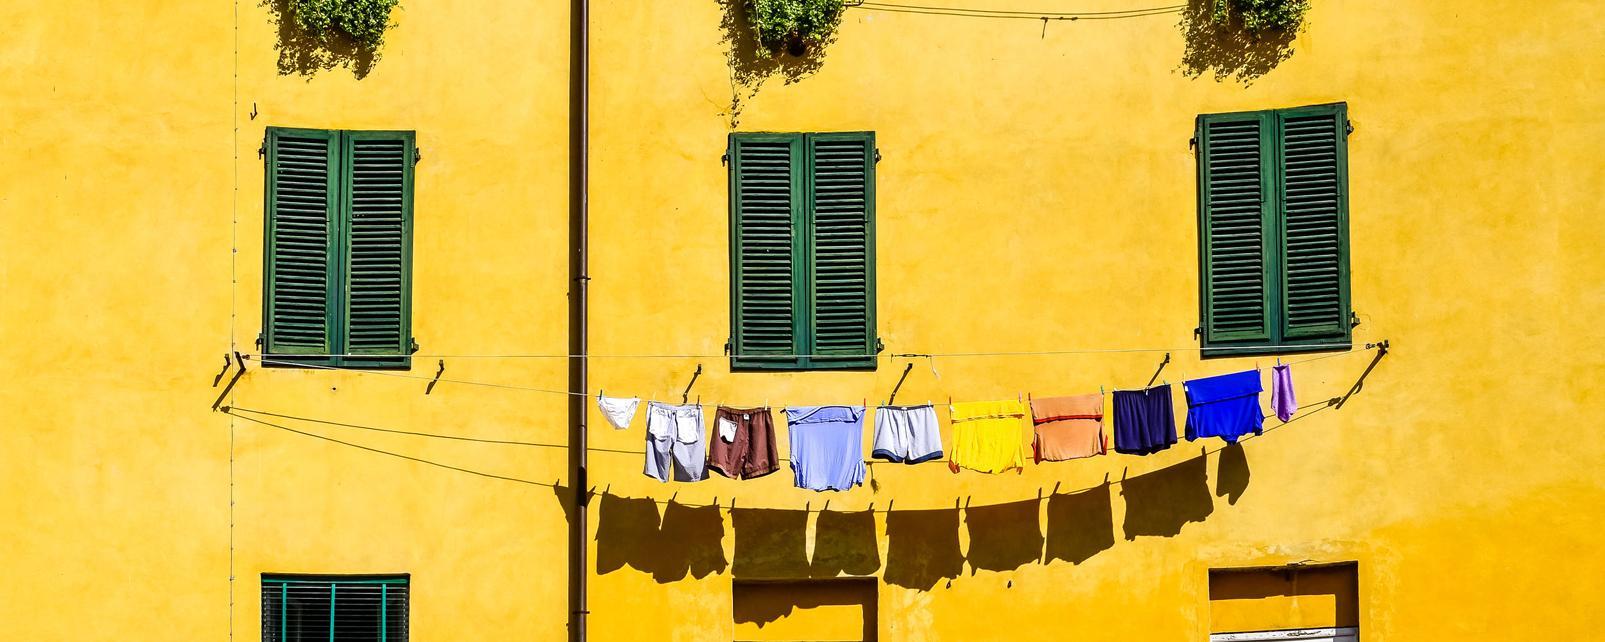 Provence-Alpes-C�te d'Azur